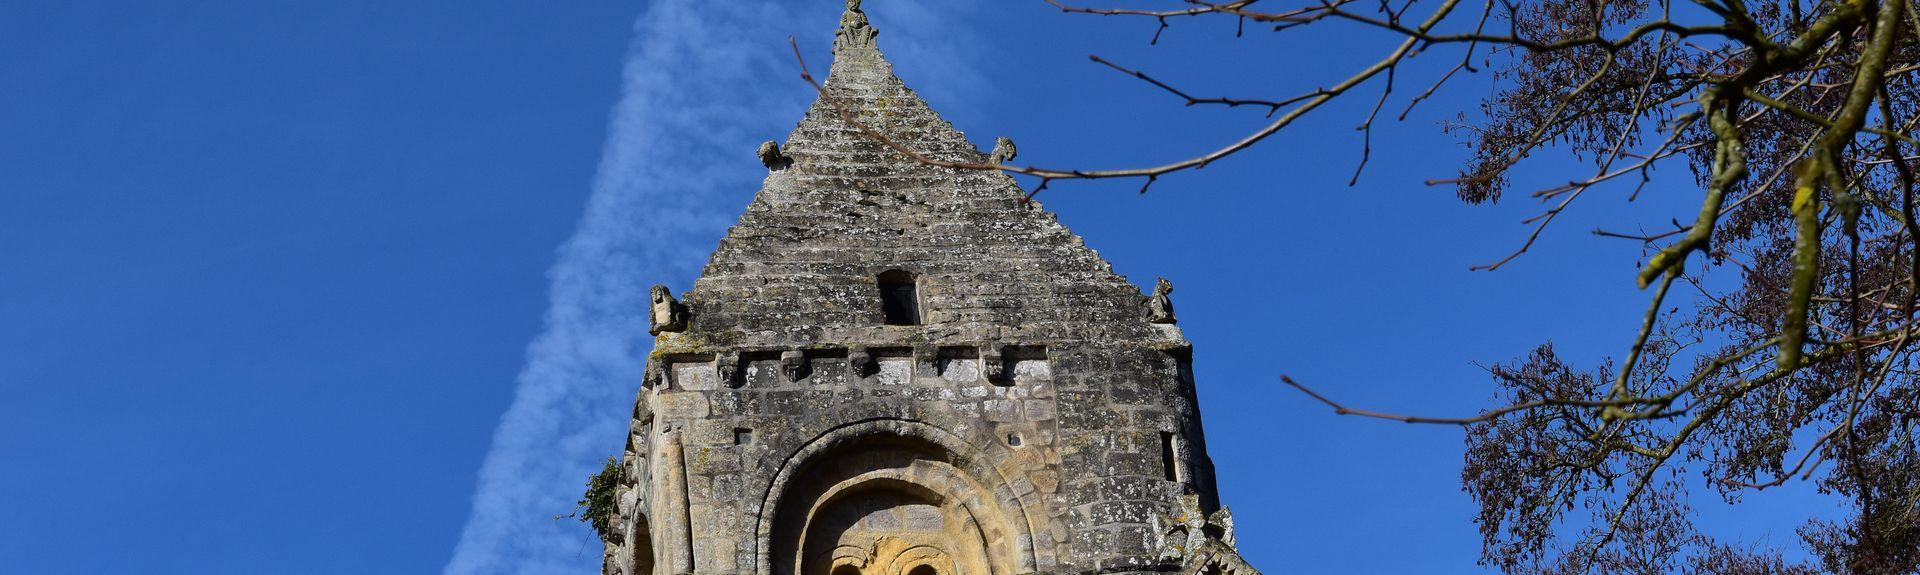 Cormelles-le-Royal, Normandía, Francia